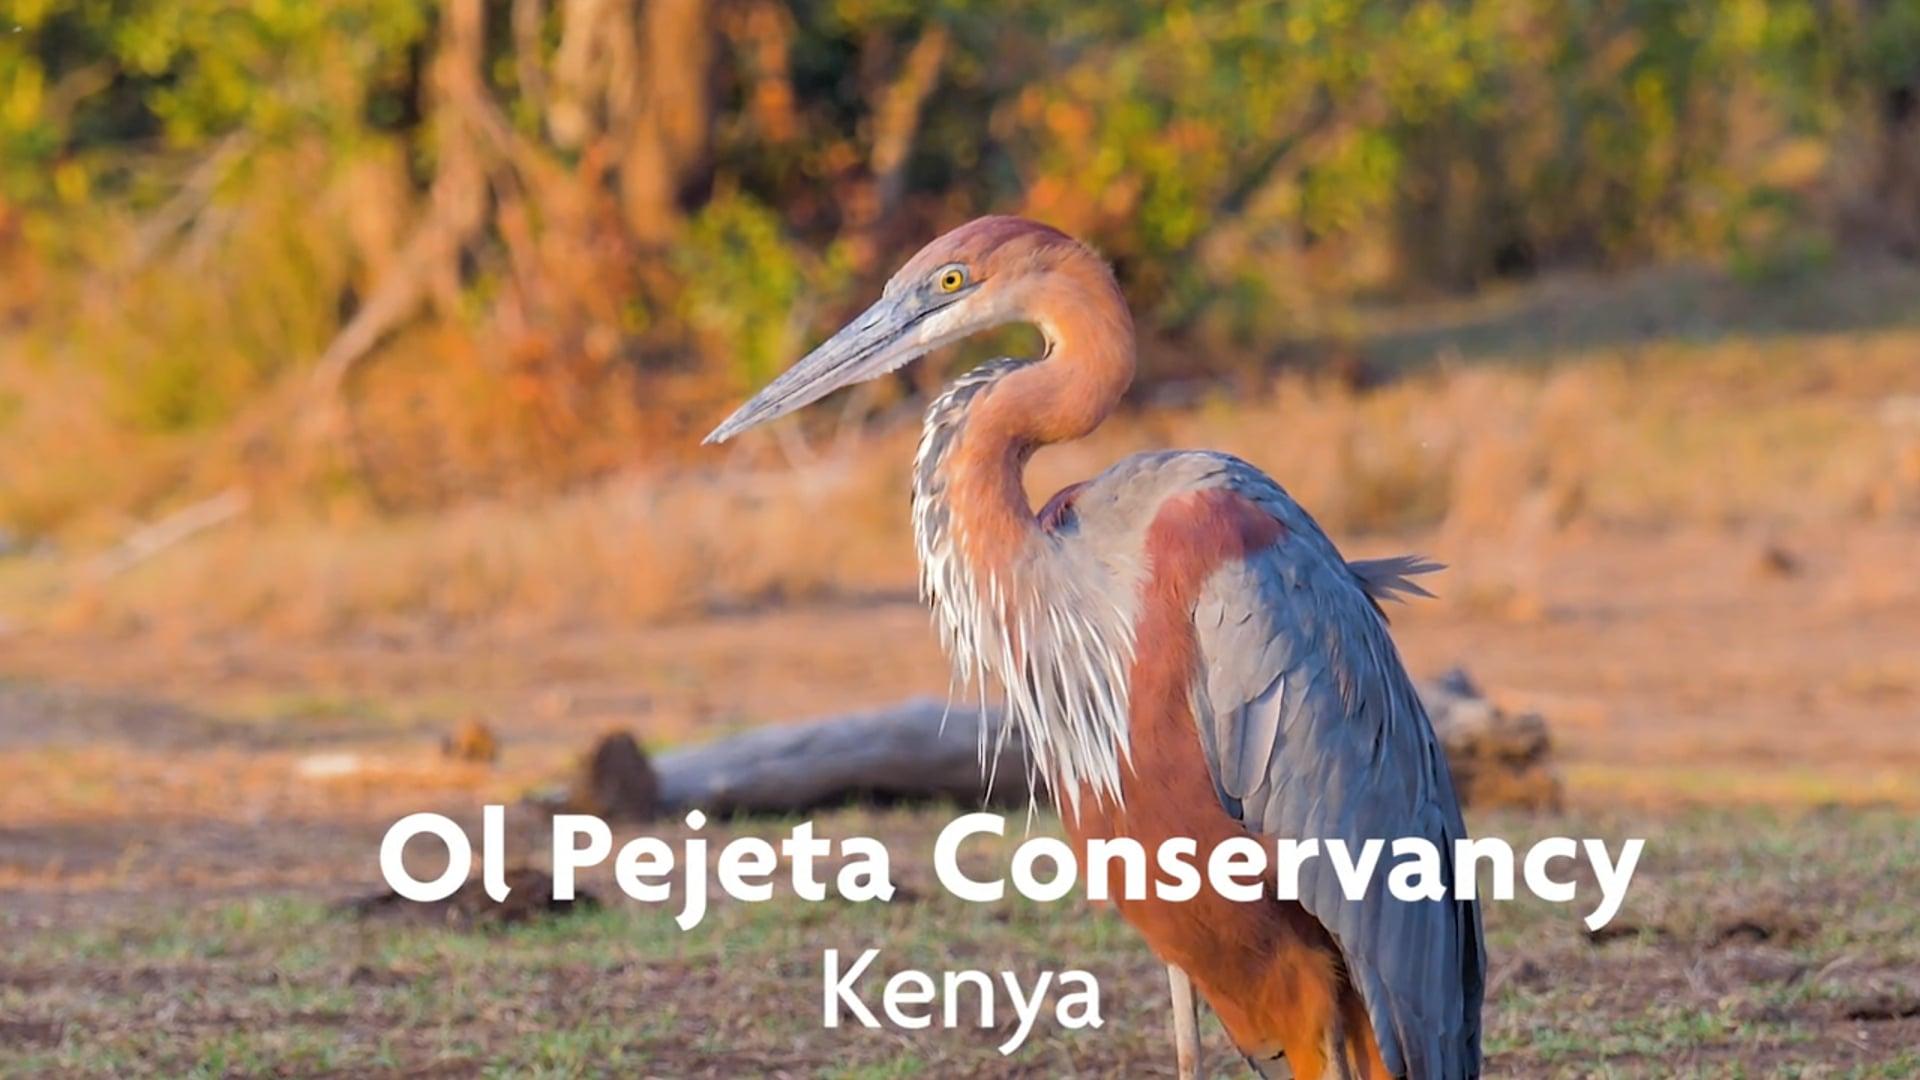 Ol Pejeta Conservancy, Kenya